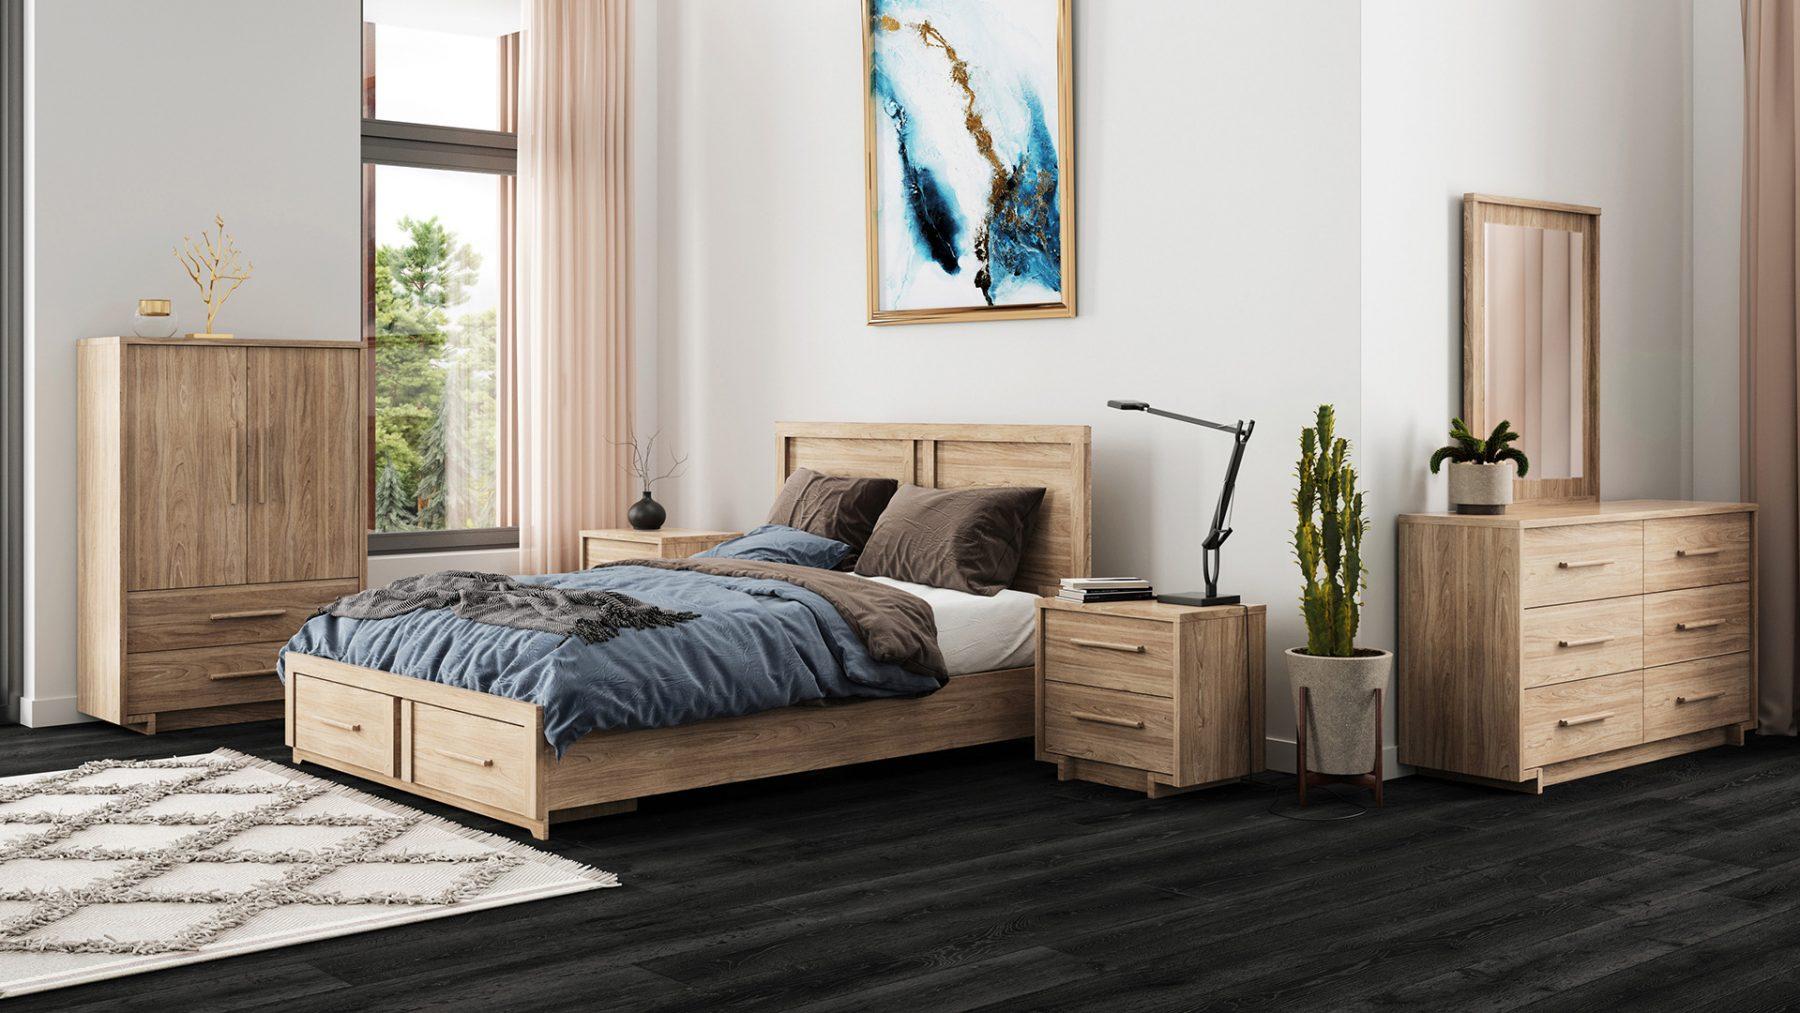 3d furniture rendering modern bedroom